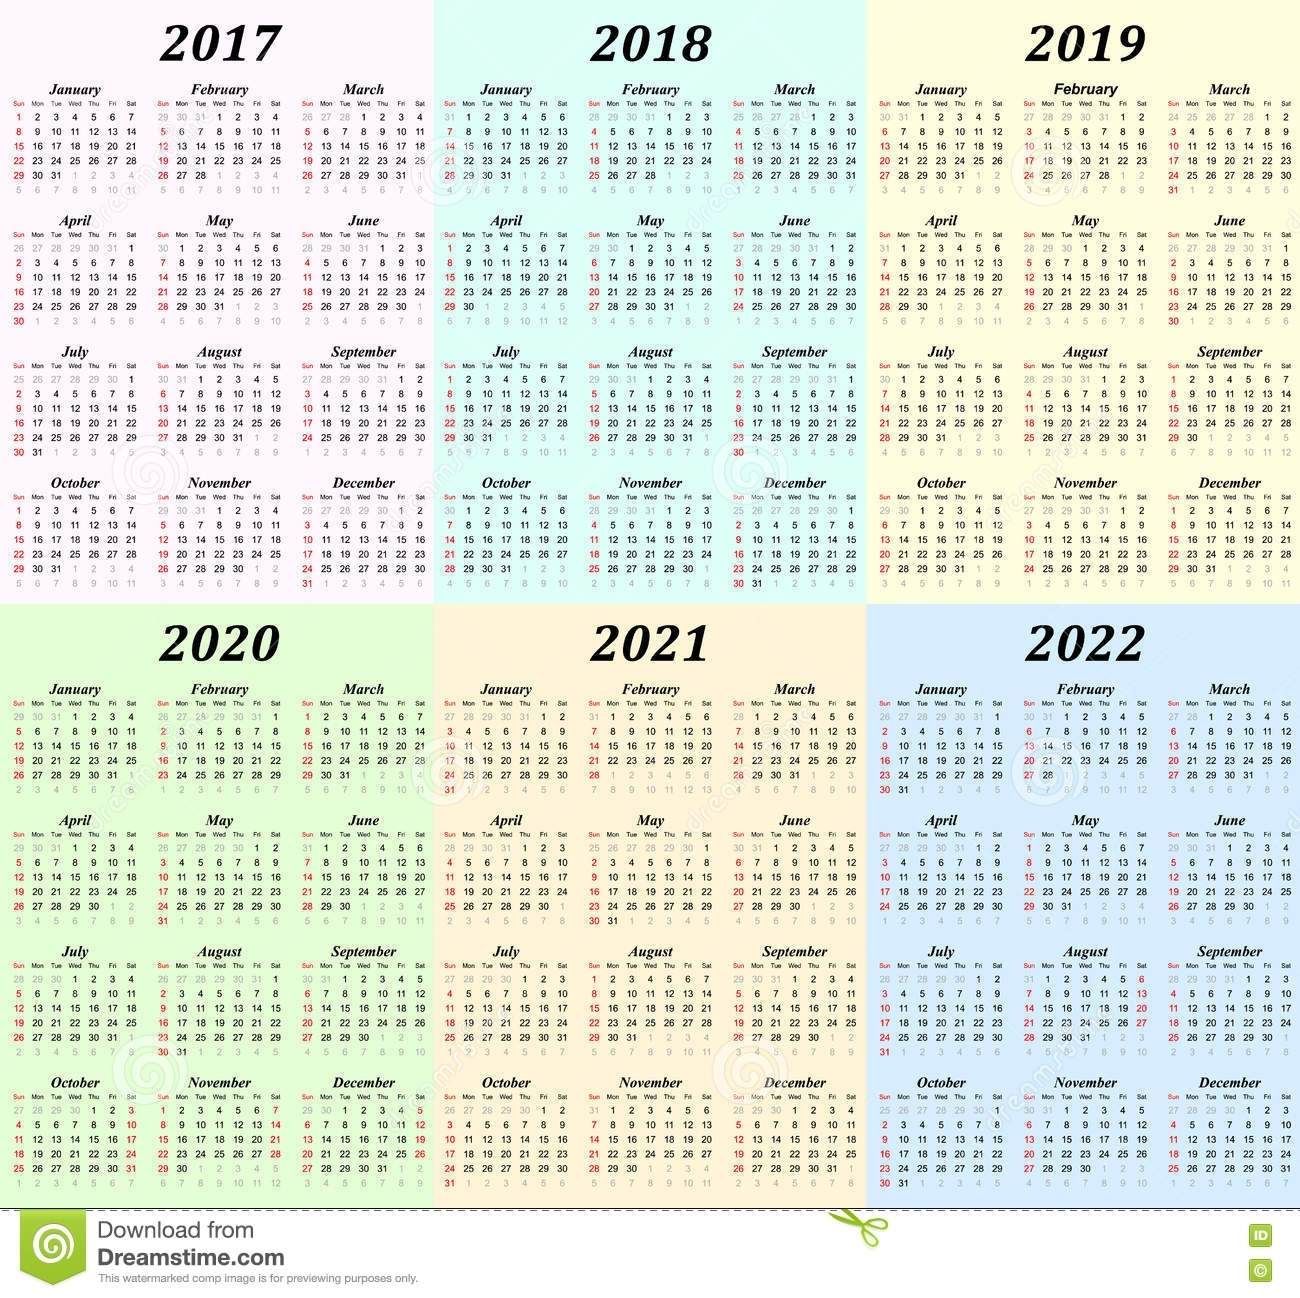 6 Year Calendar 2020 To 2022